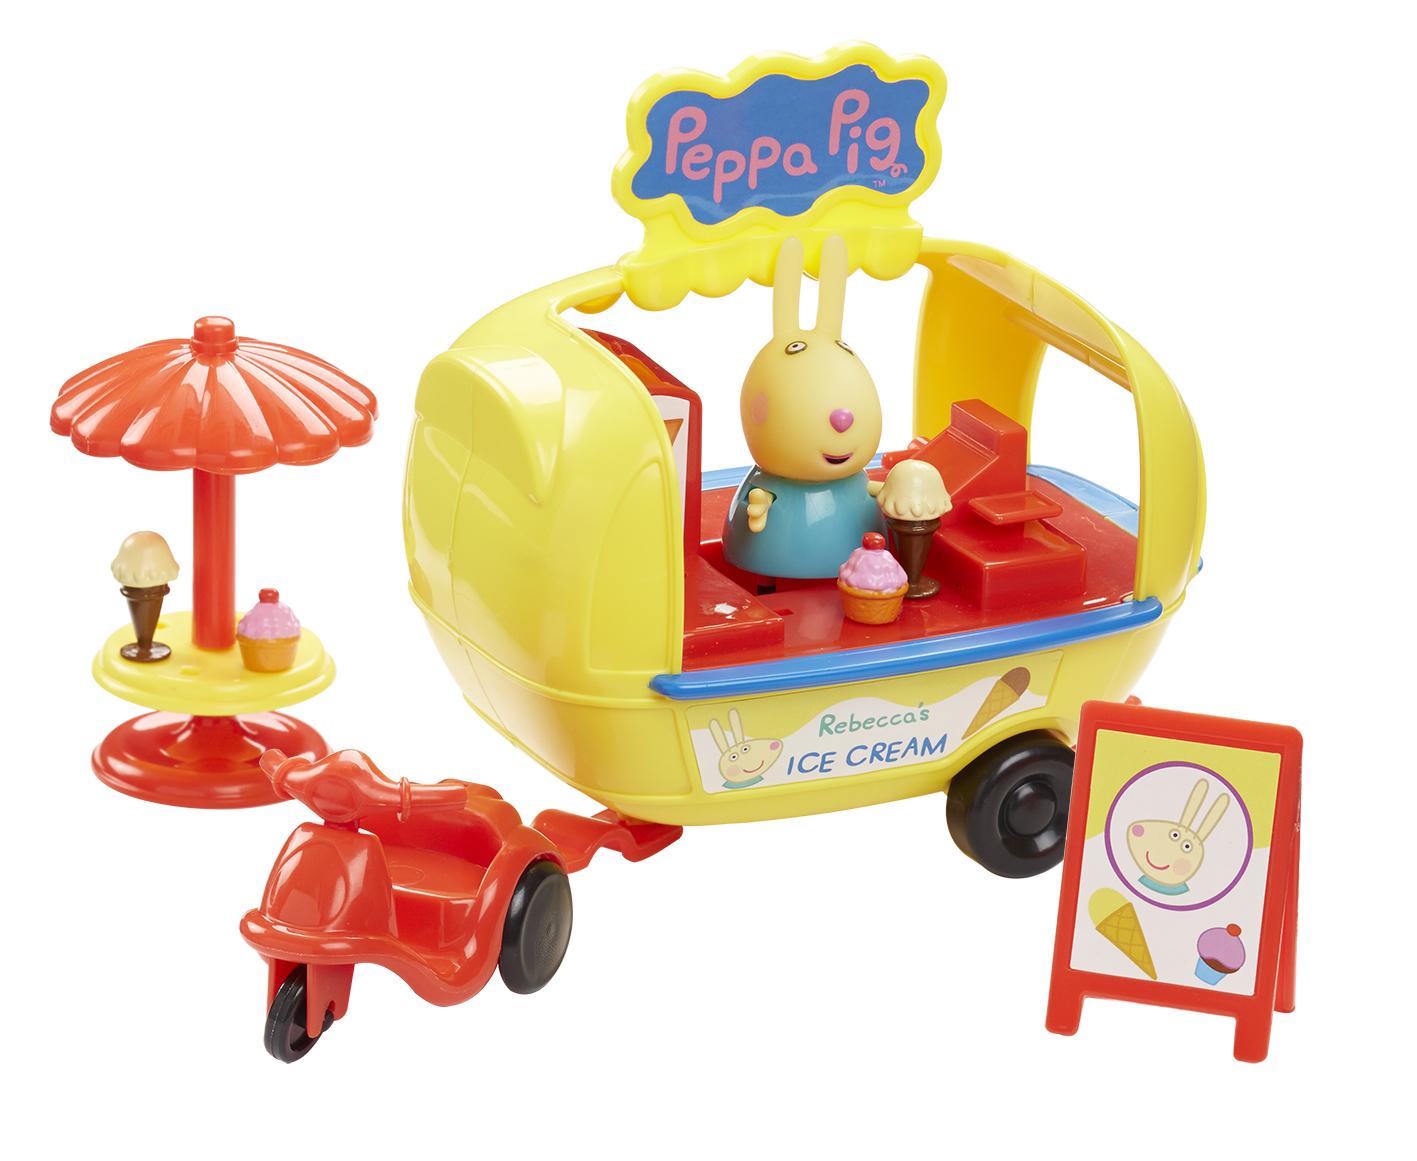 Peppa Pig Набор фигурок Кафе-мороженое Ребекки игровые наборы свинка пеппа peppa pig игровой набор кафе мороженое ребекки